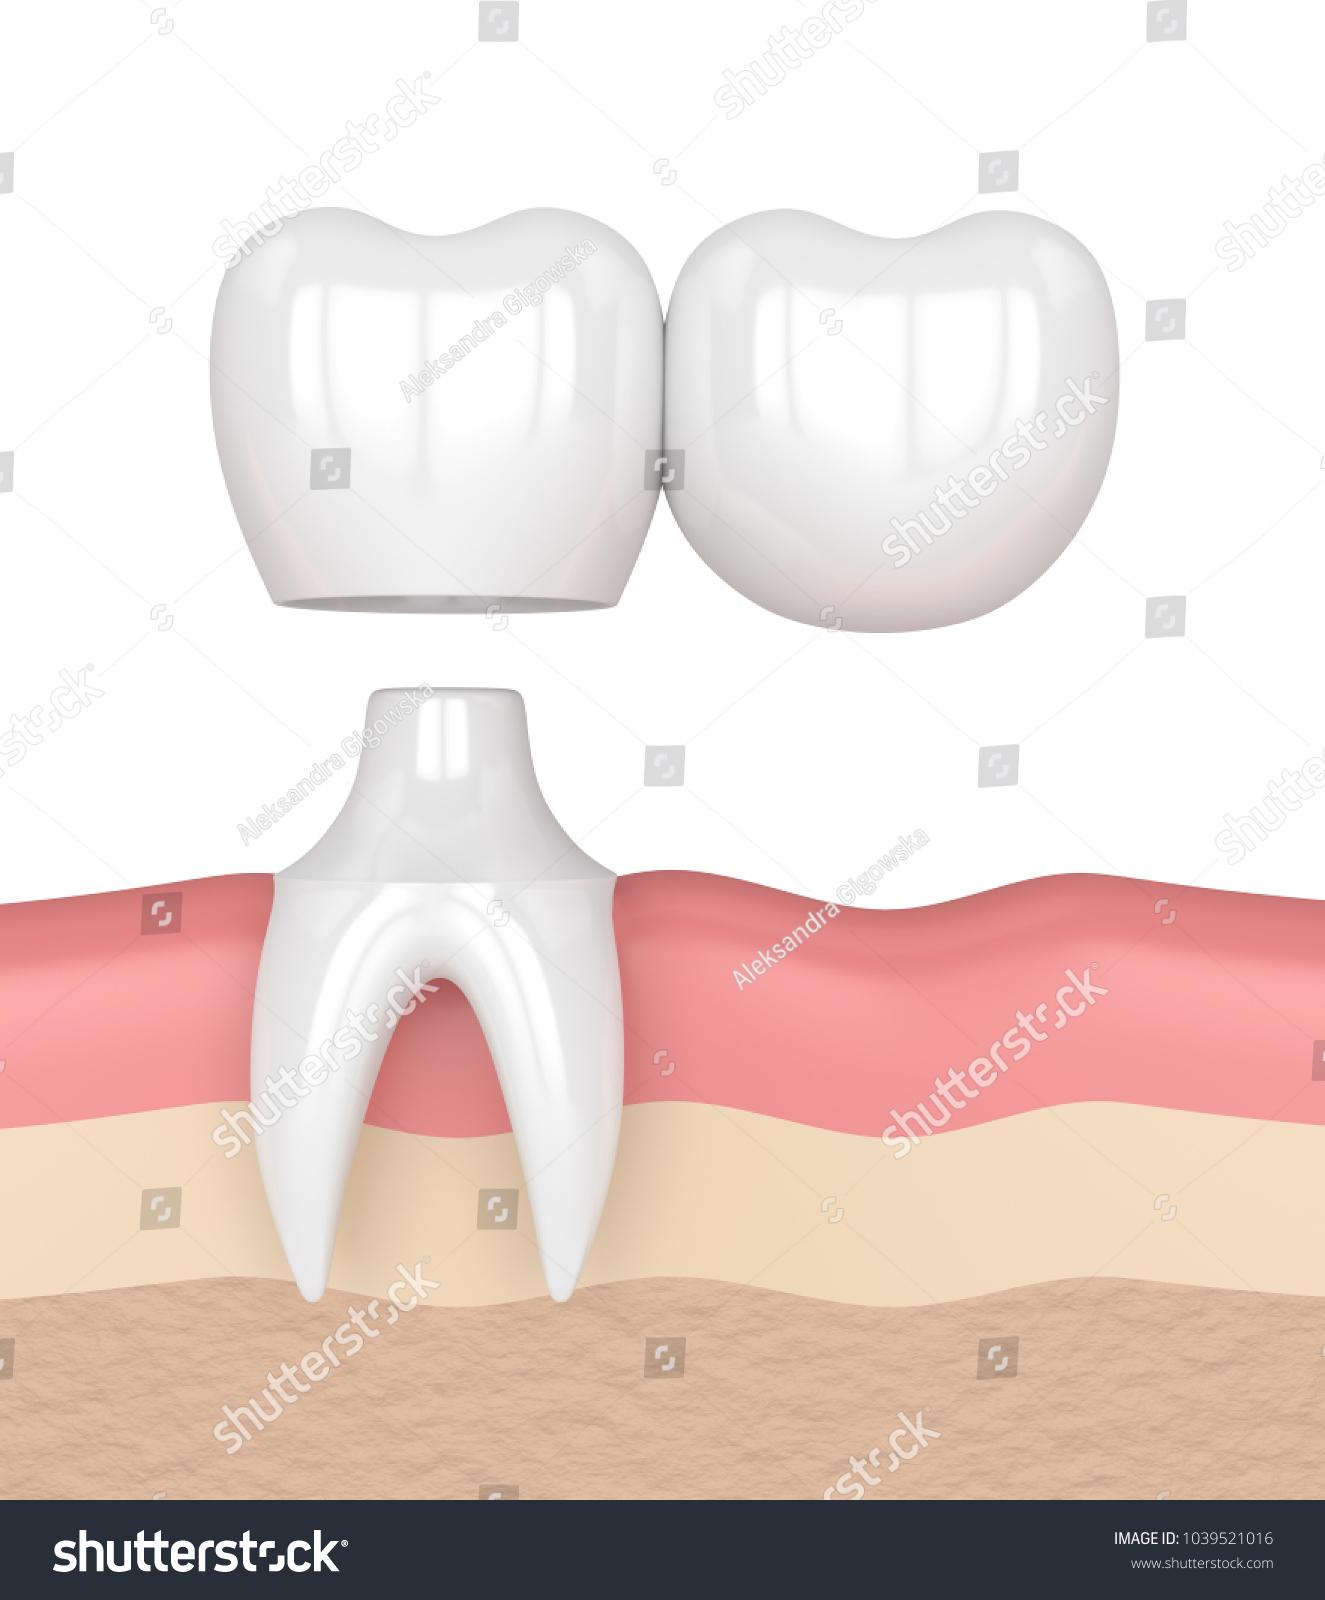 3d Render Of Dental Bridge With Crowns In Gums Ez Canvas Cantilever Diagram Related Keywords